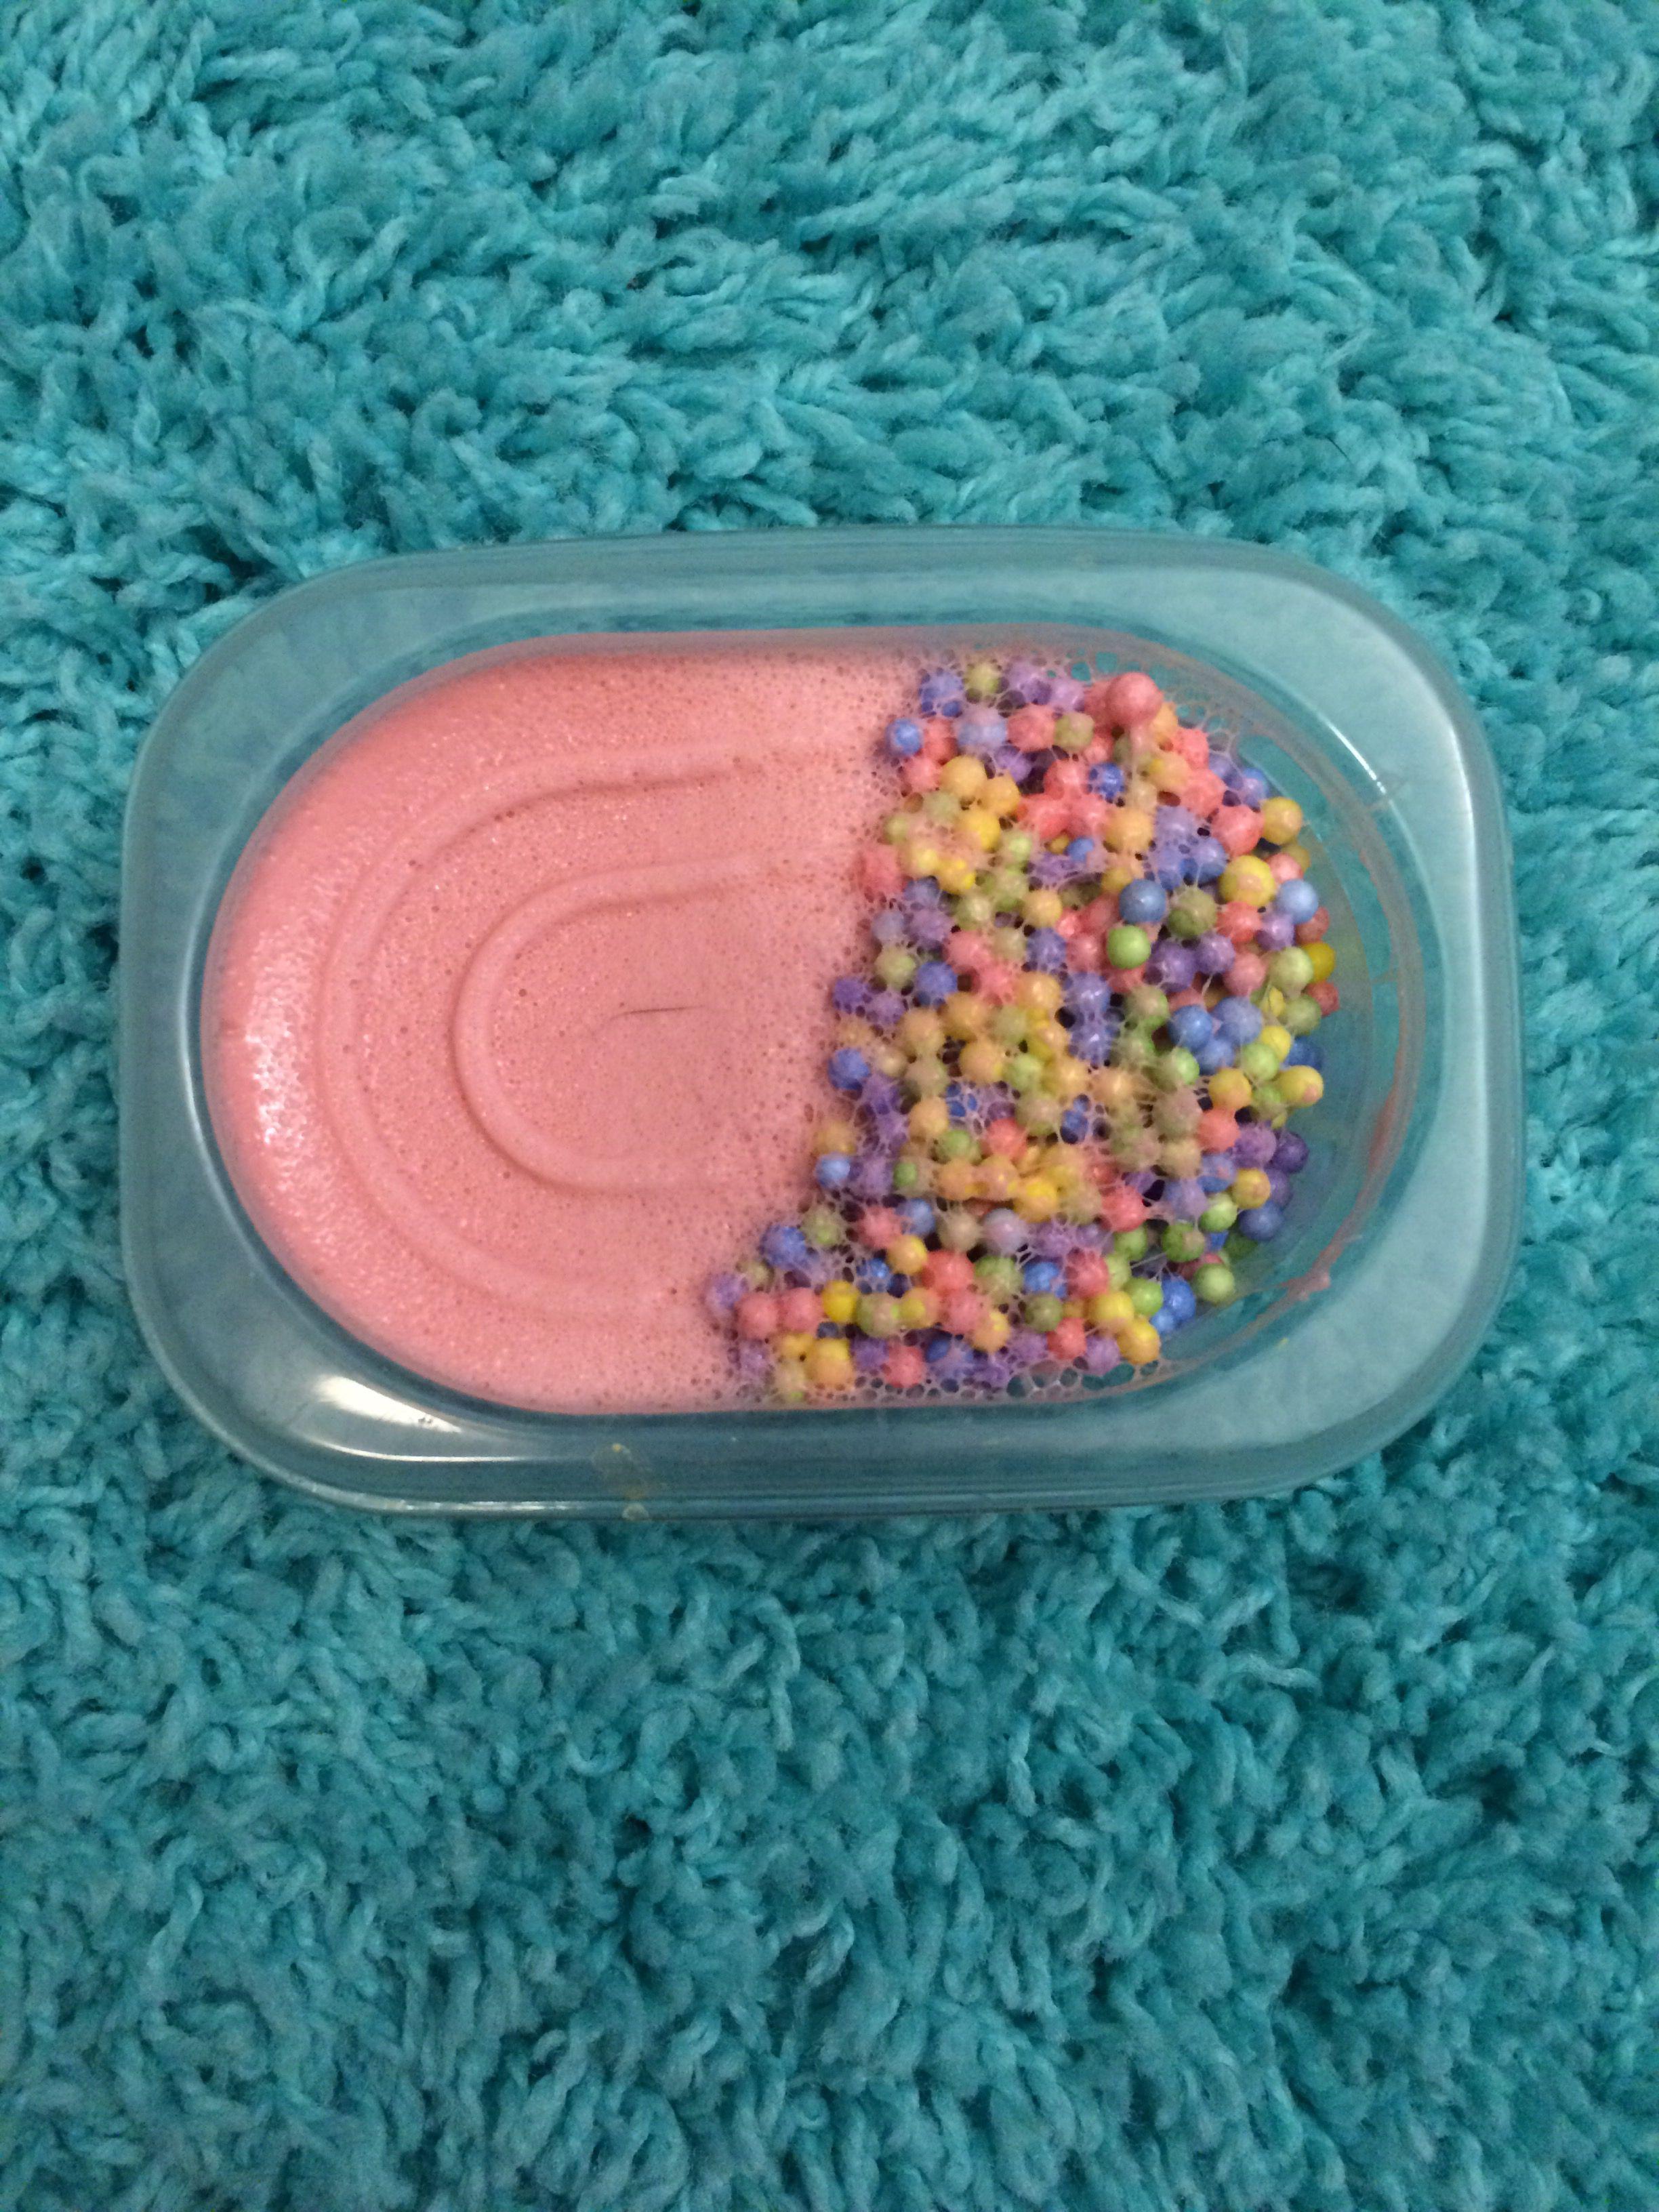 Pin By Jamie Hartman On Emma S Slime Foam Slime Slime Recipe